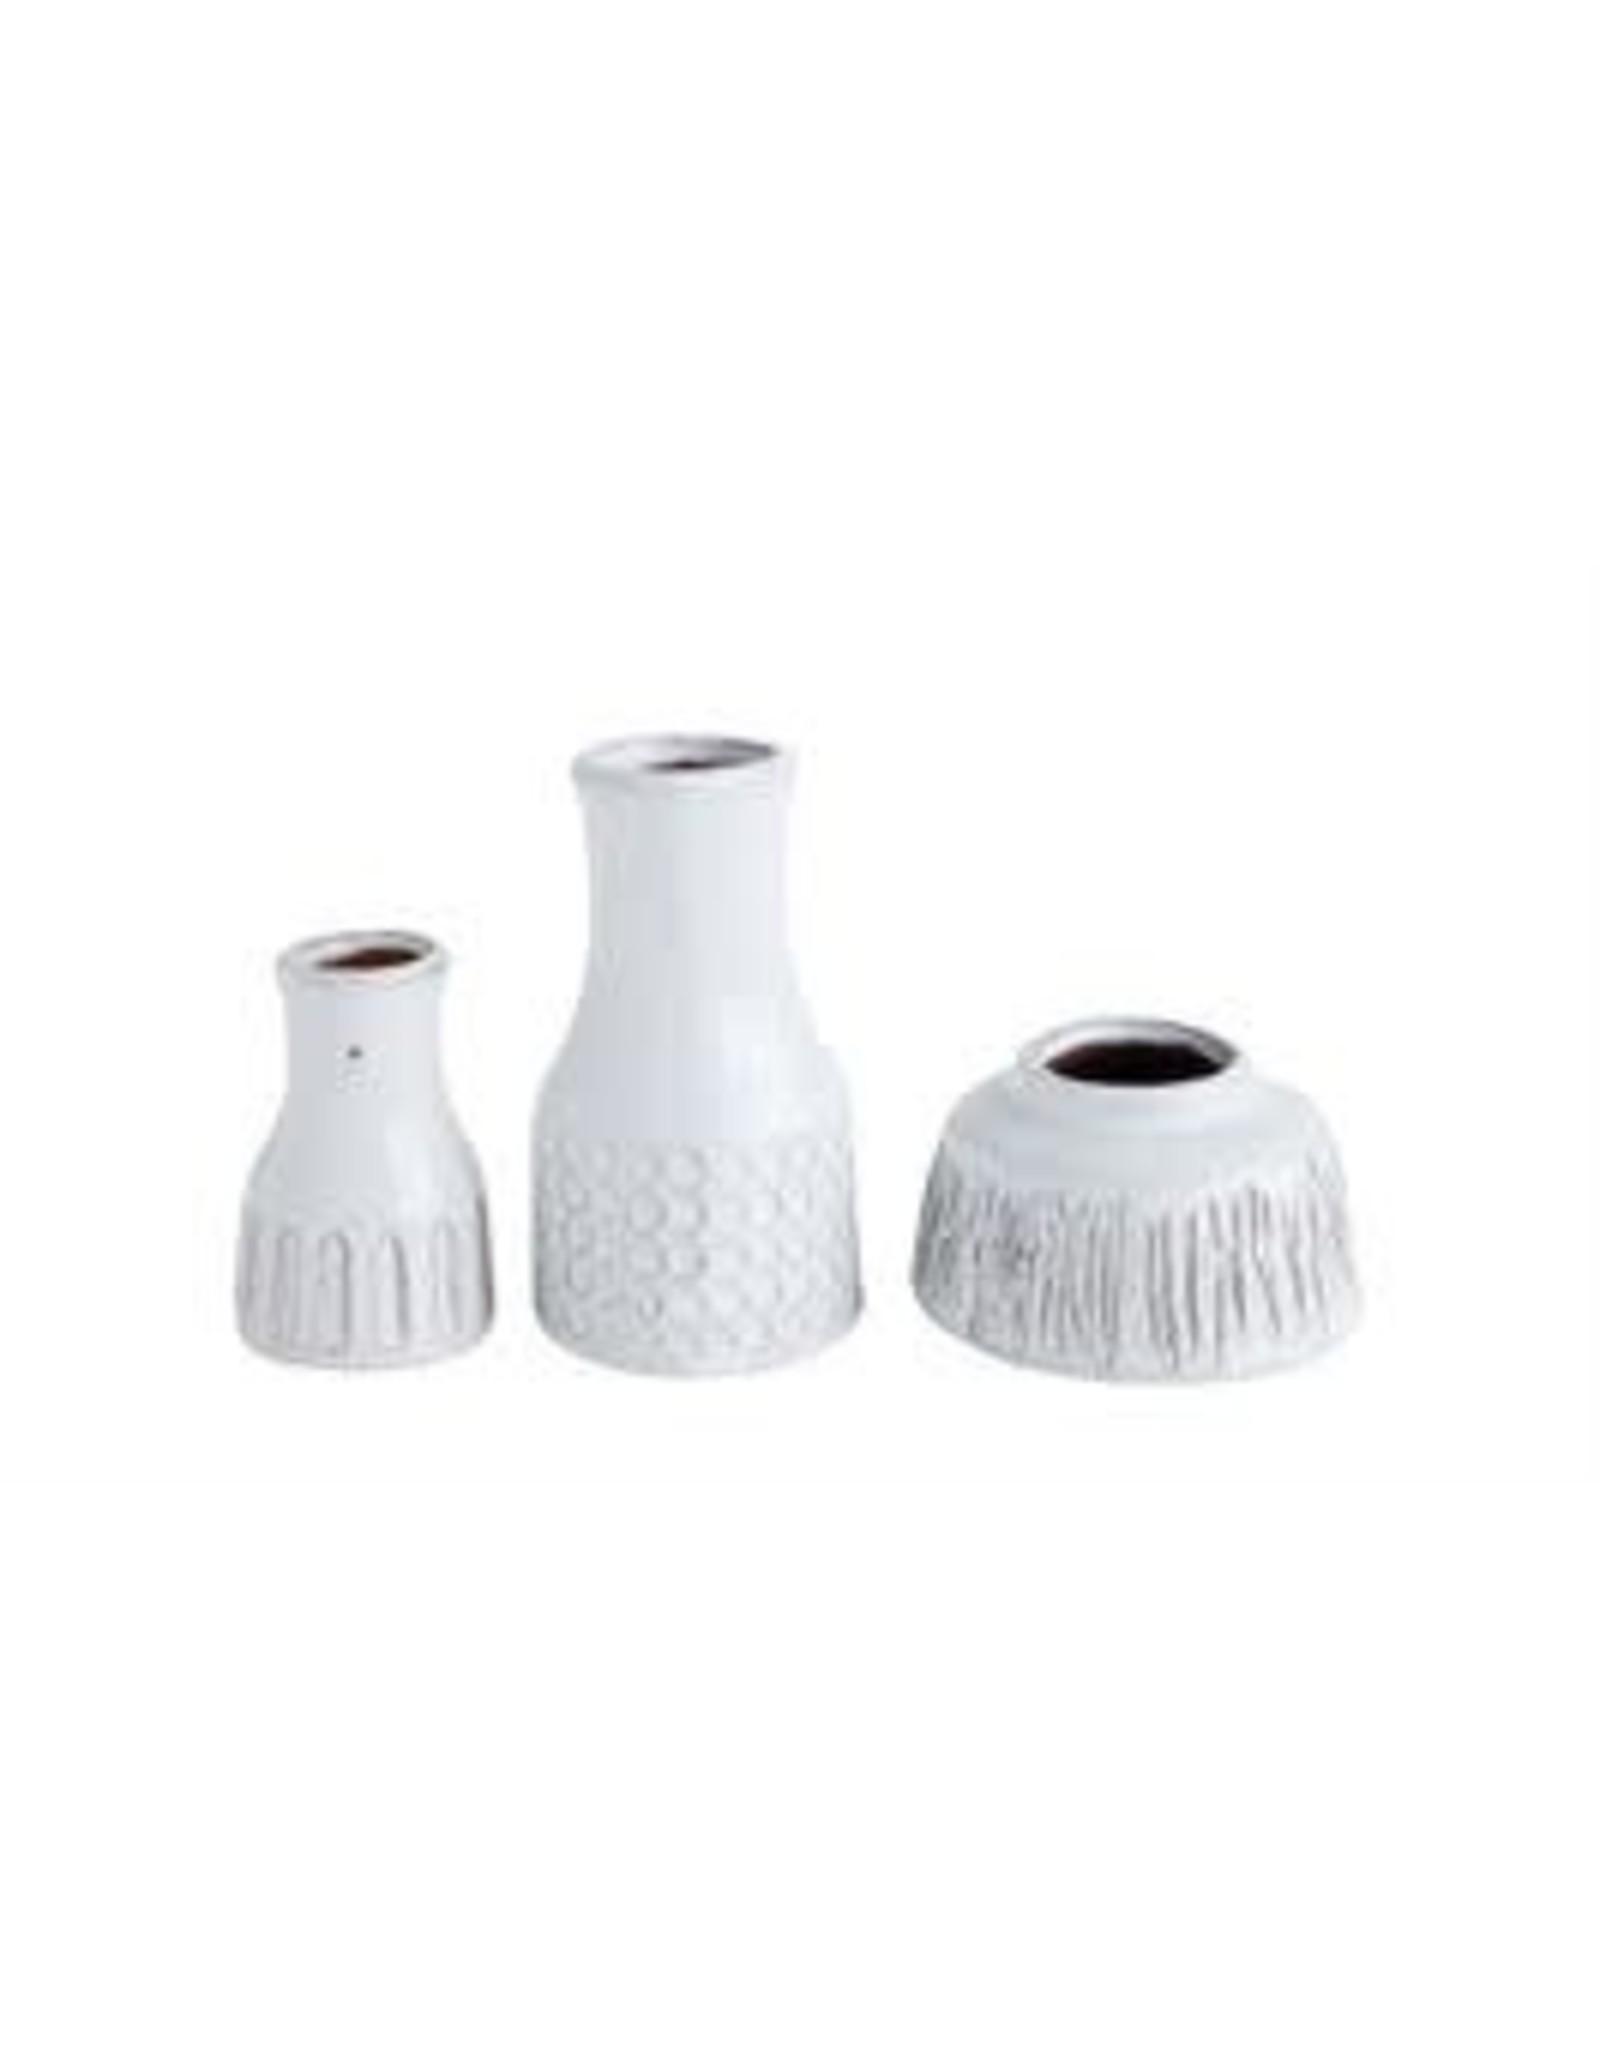 Website Terra-cotta Vases